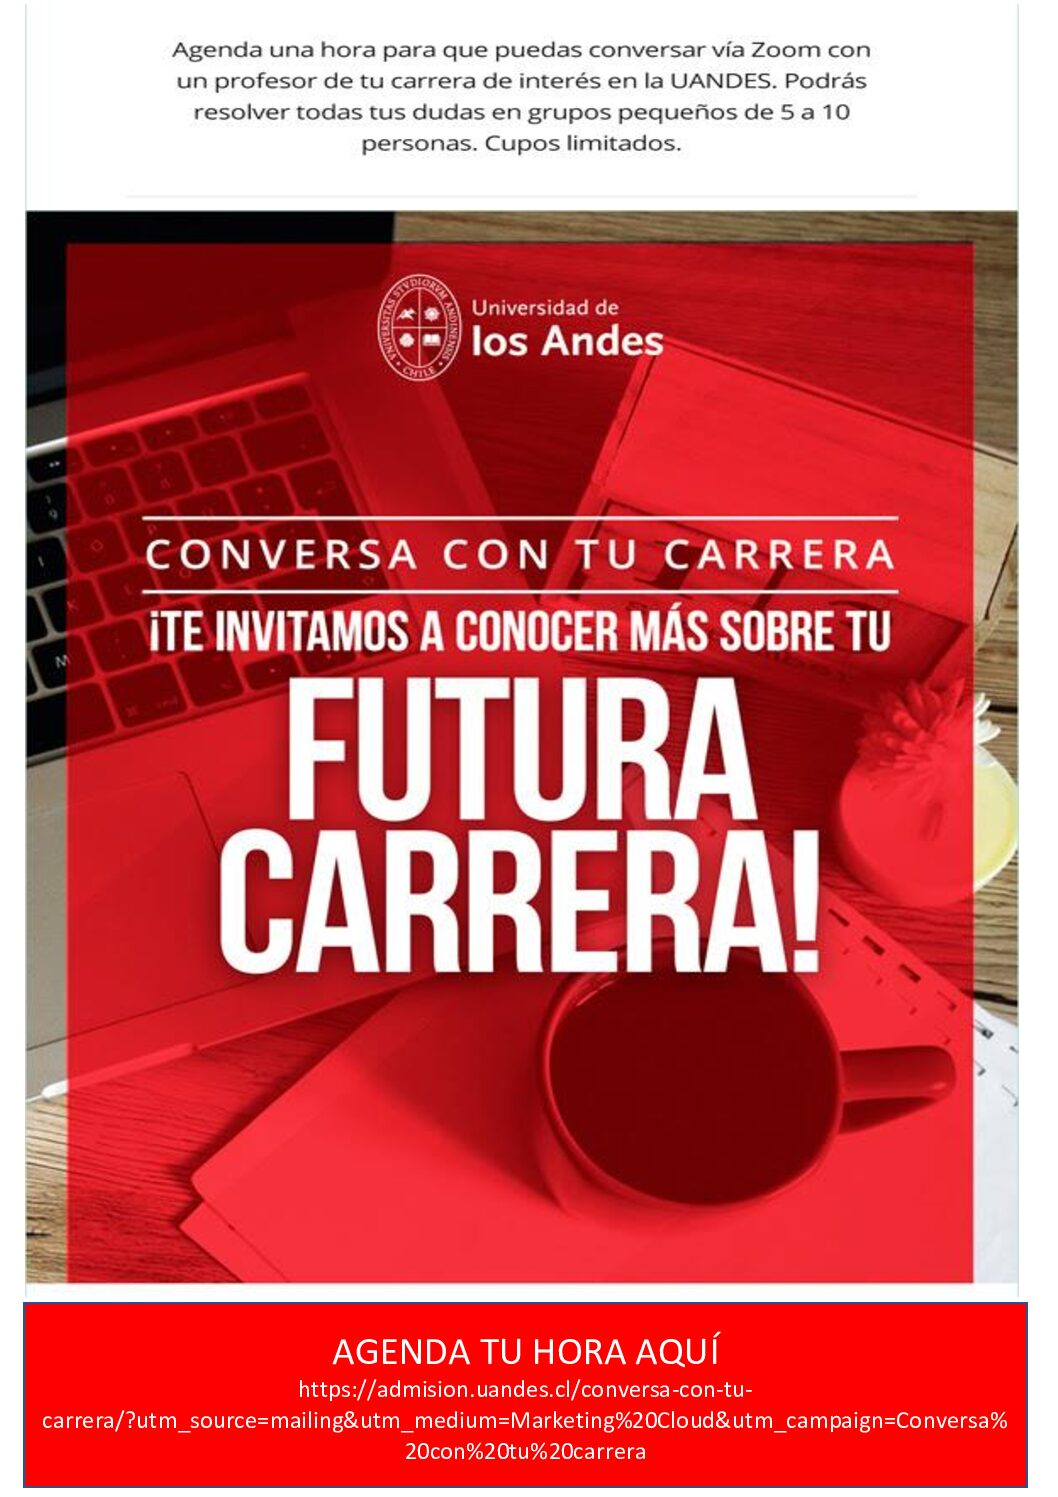 Conversa con tu carrera U. Andes